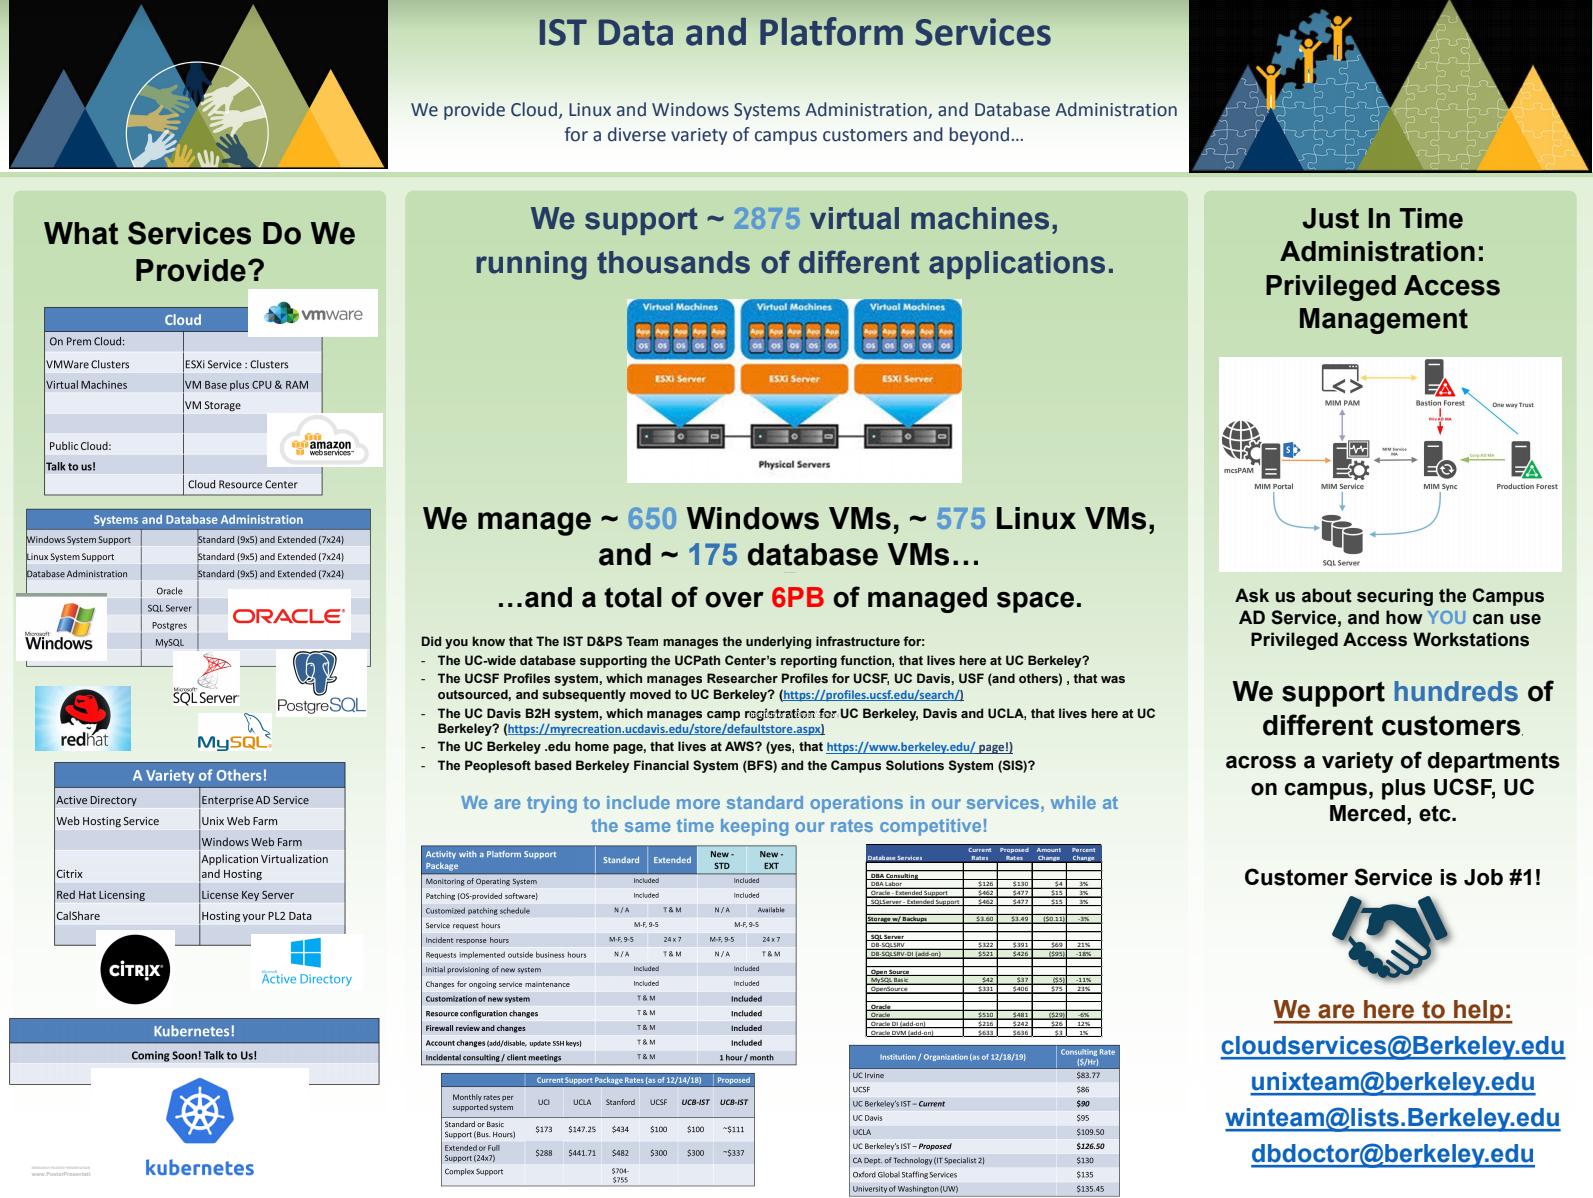 image for Data Platforms poster